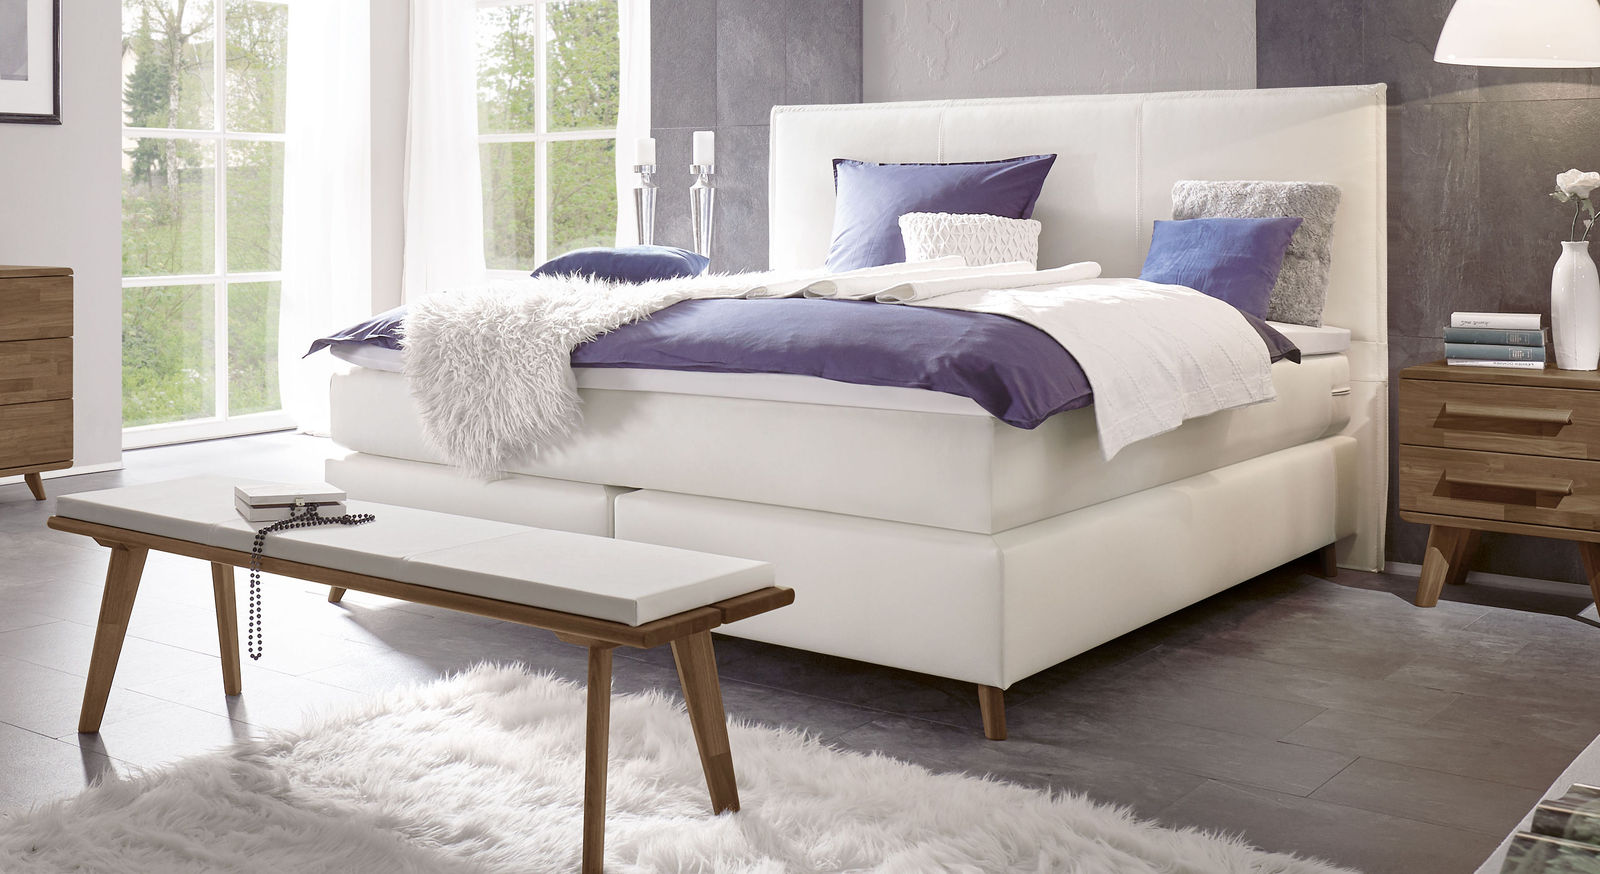 Boxspringbett Marum mit weißem Luxus-Kunstlederbezug